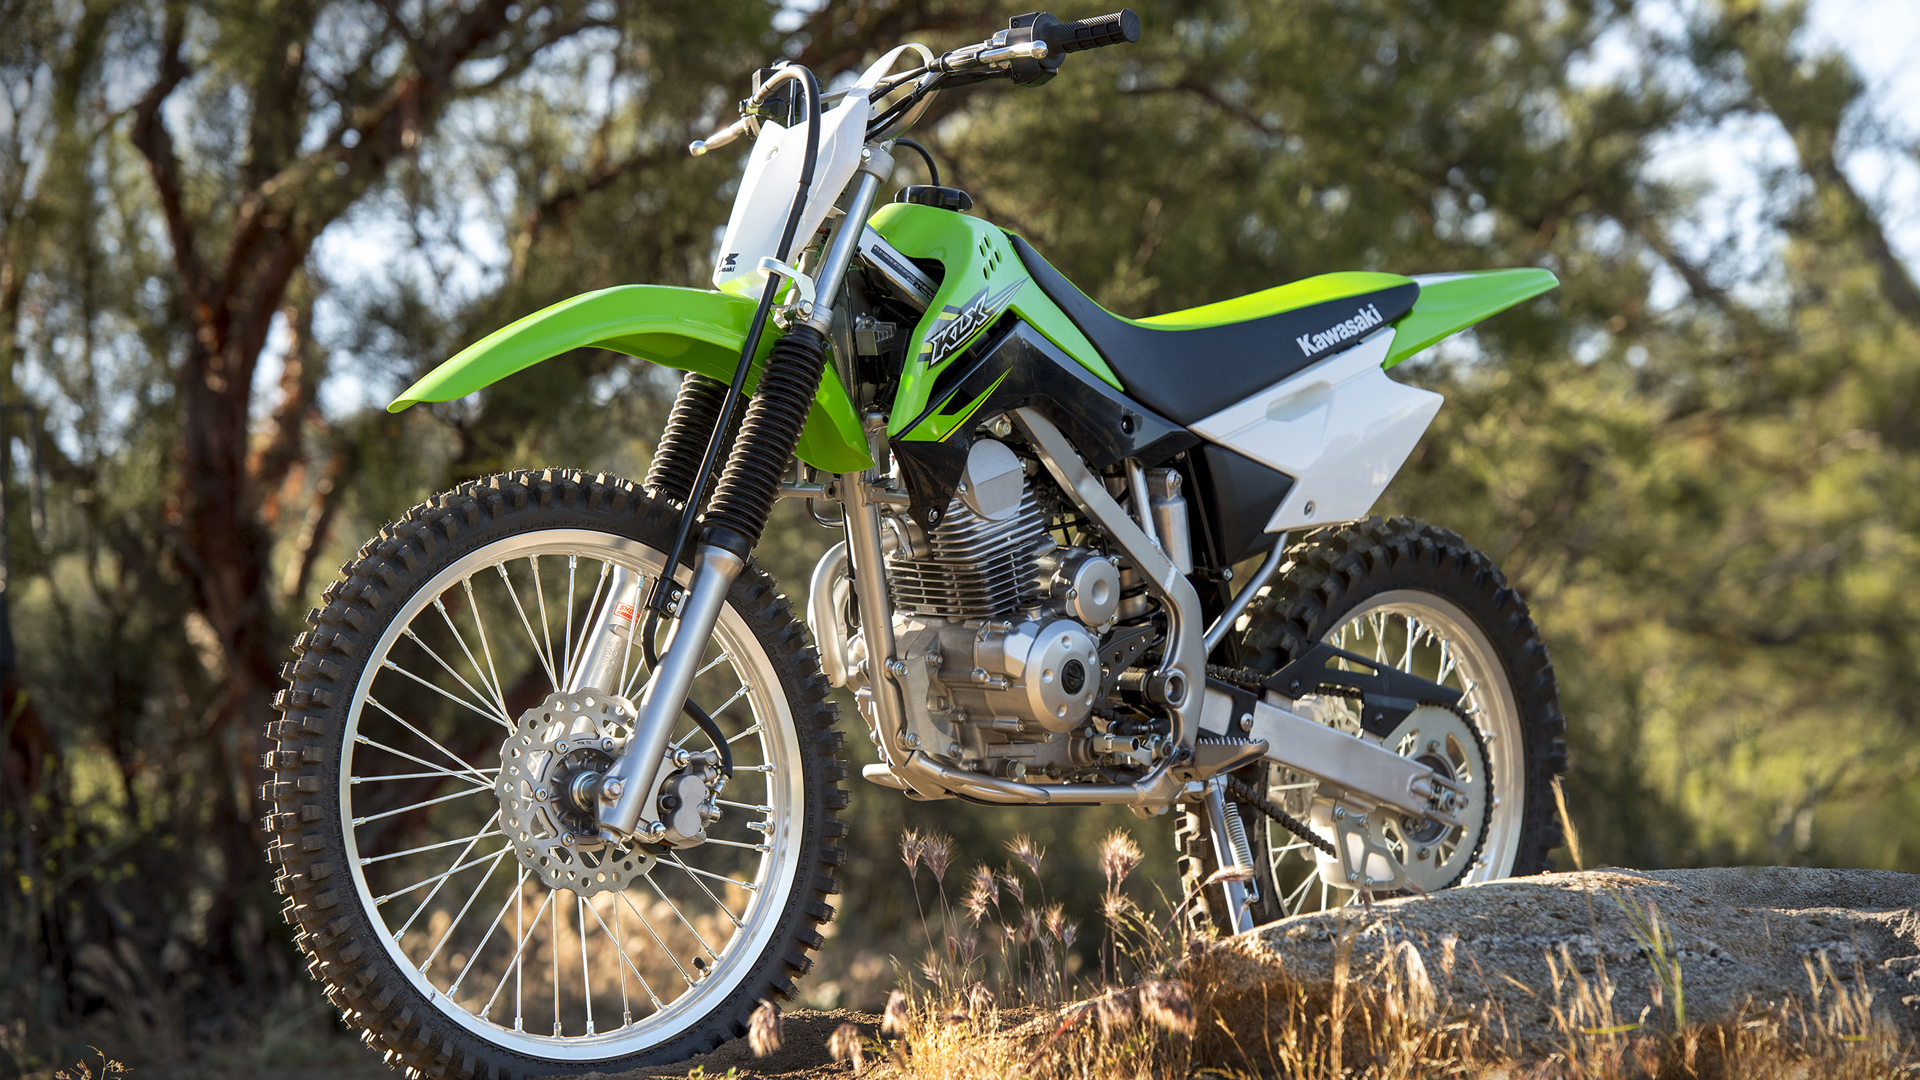 Kawasaki KLX 140 2017 STD